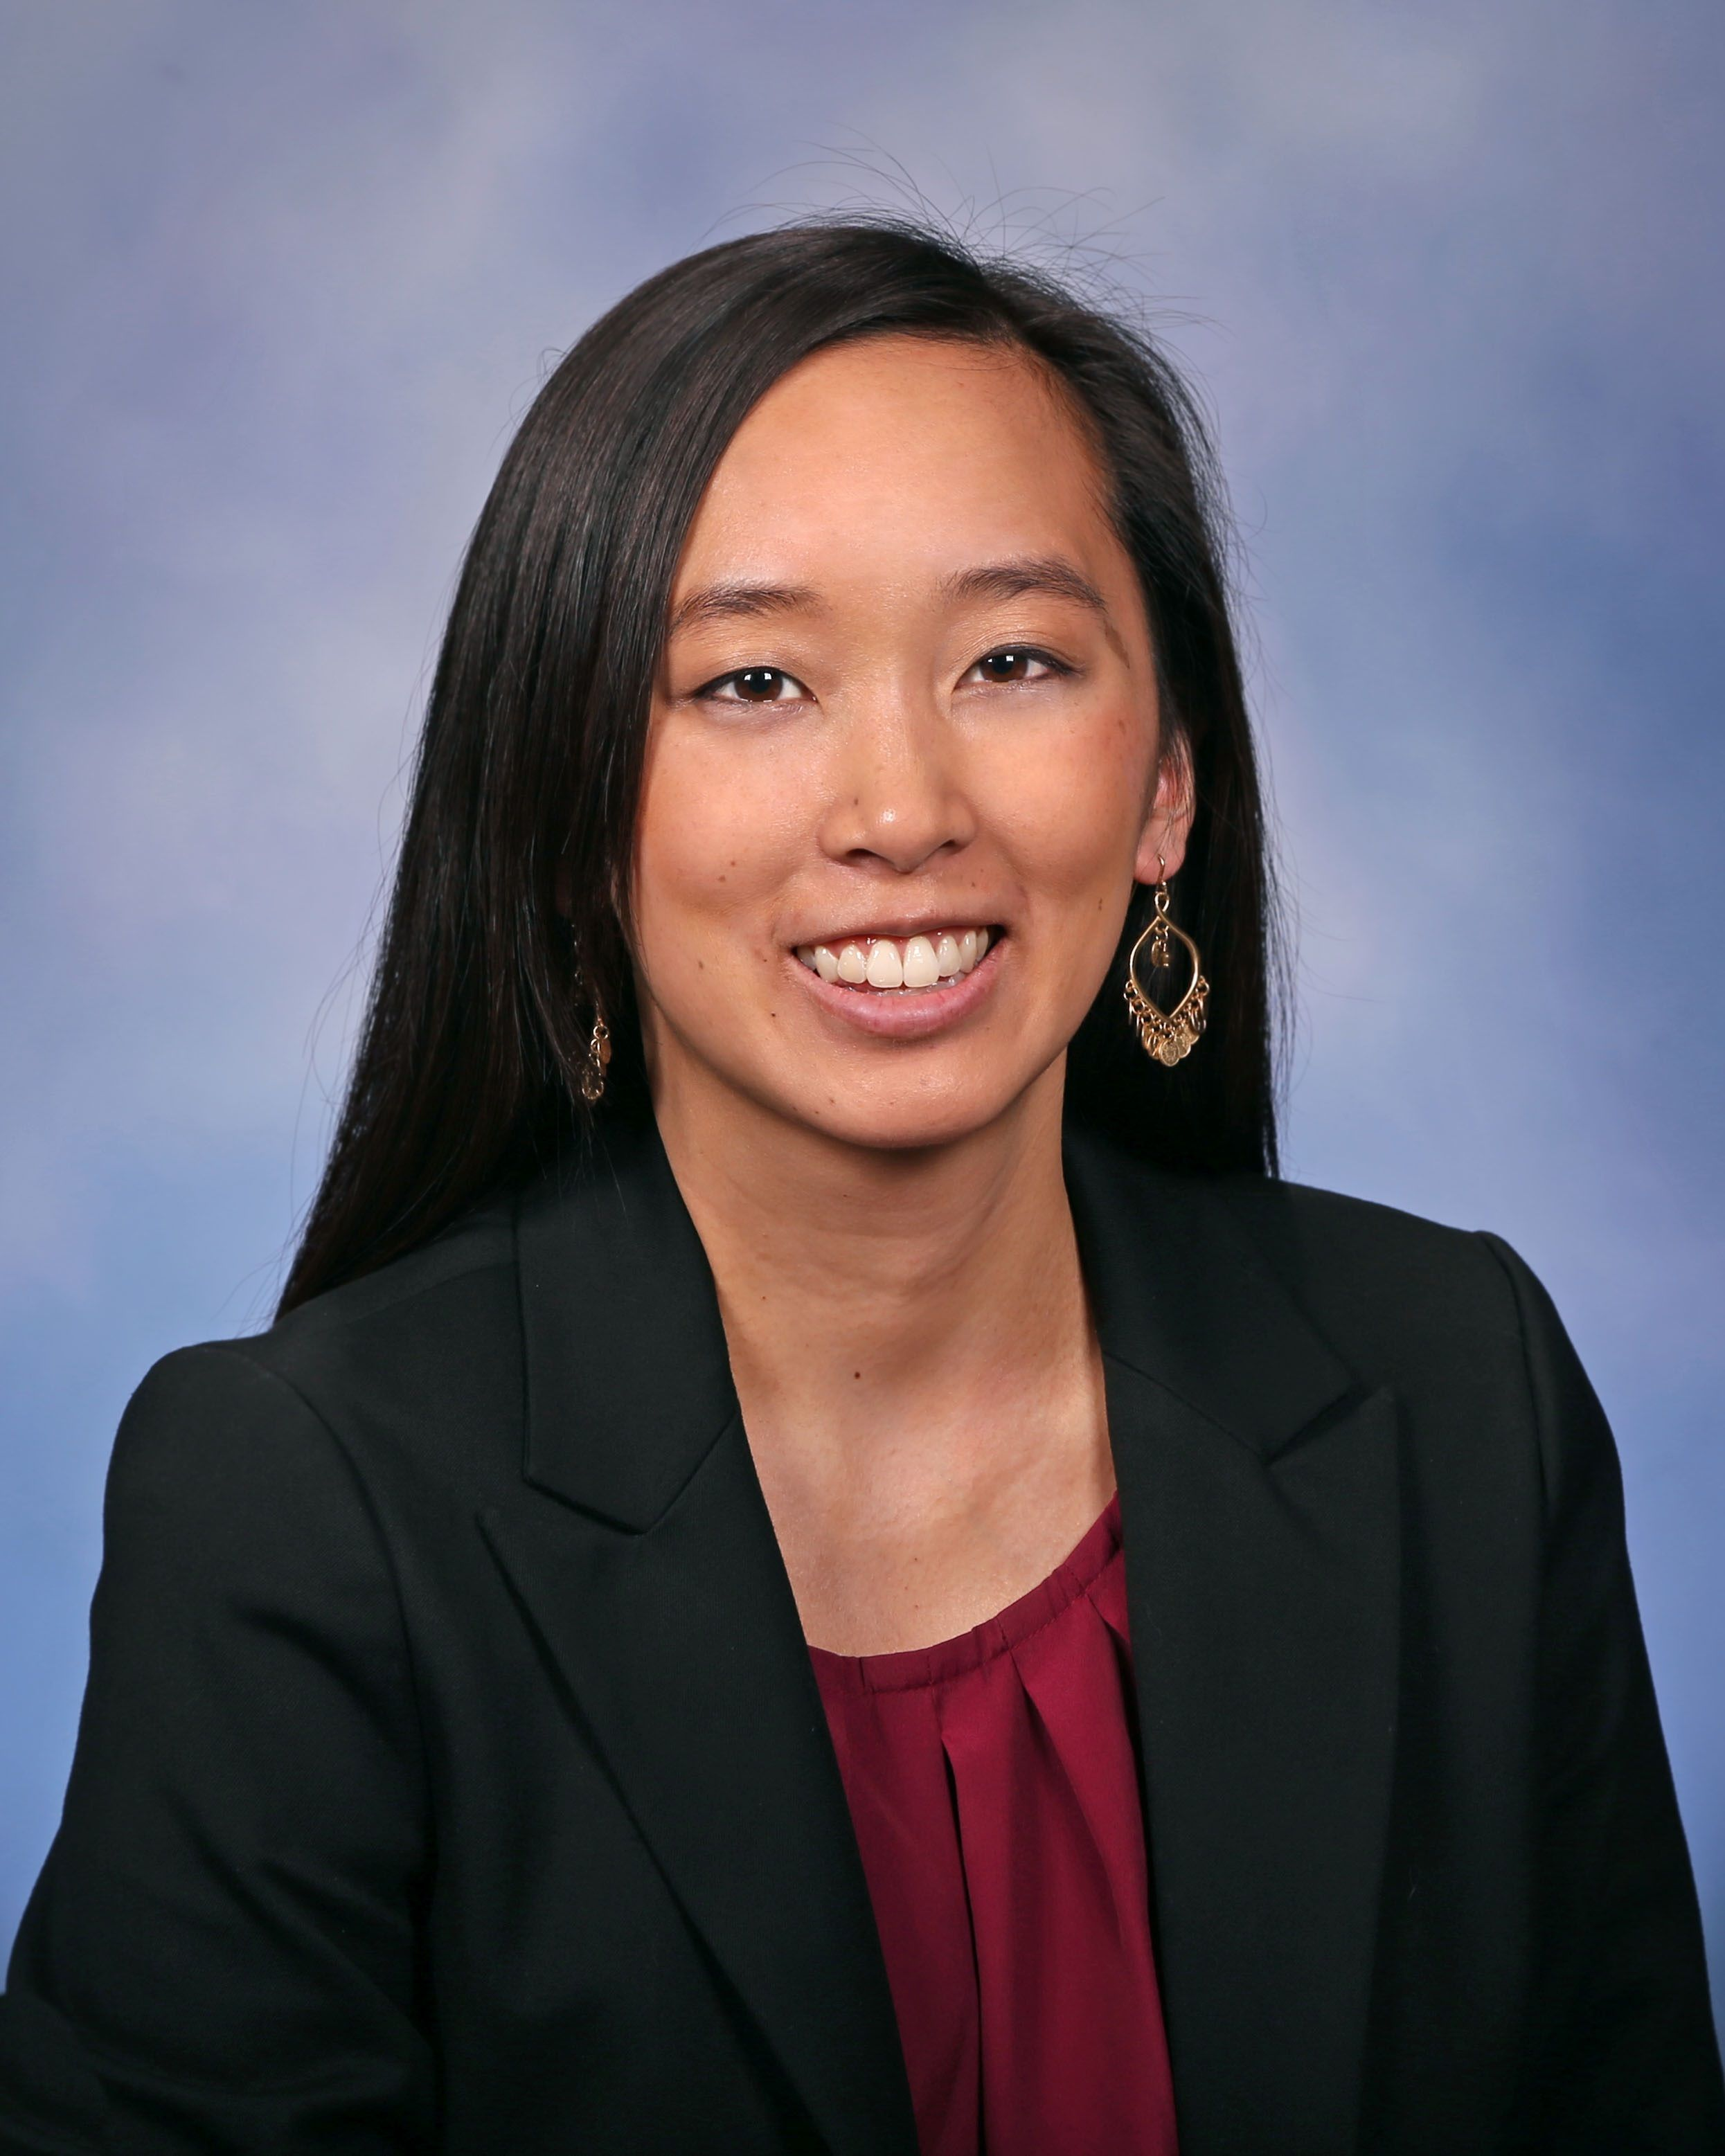 Michigan State Sen. Stephanie Chang, D-Detroit